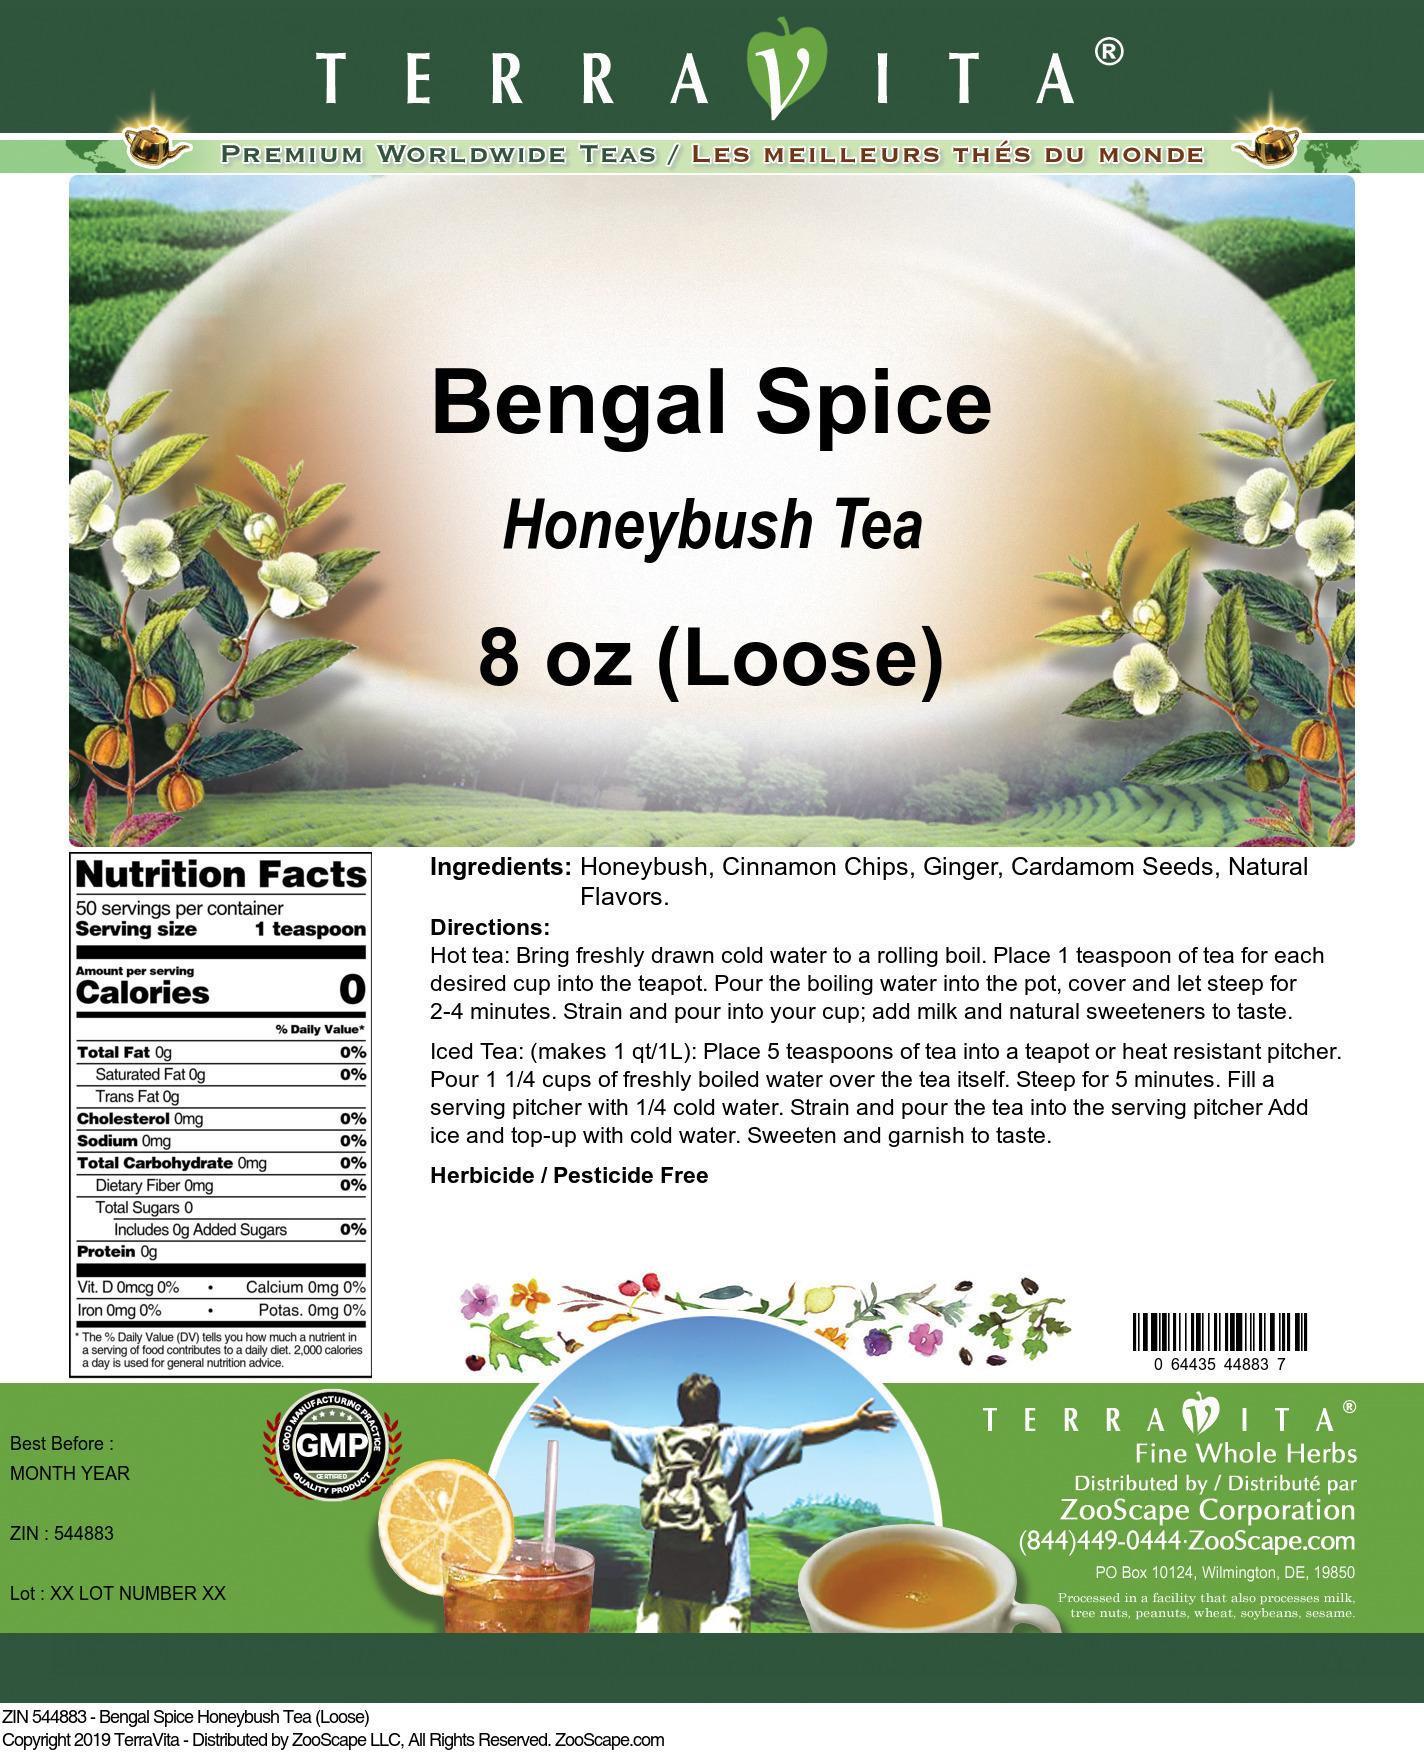 Bengal Spice Honeybush Tea